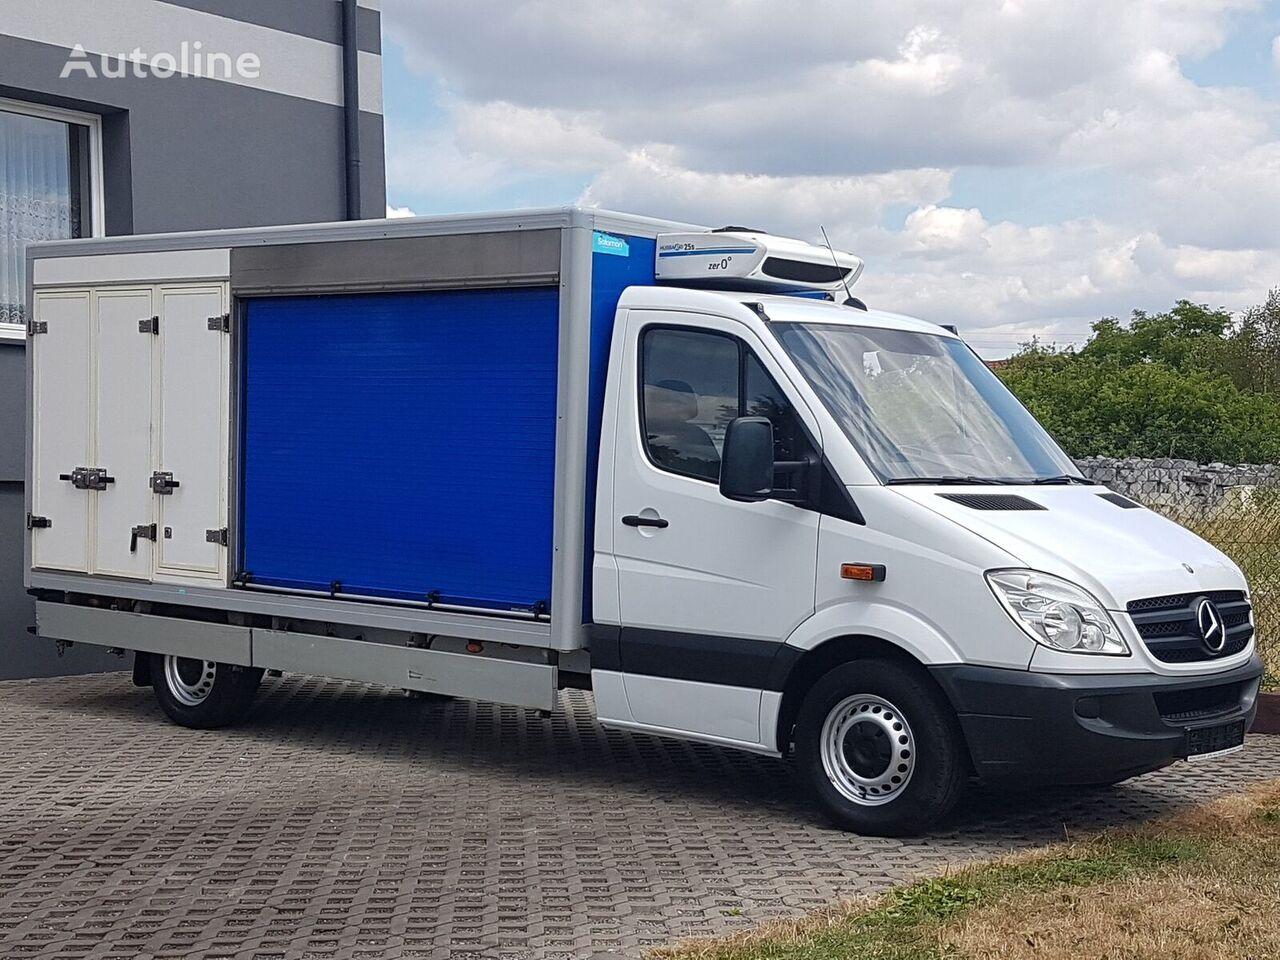 sunkvežimis šaldytuvas < 3.5t MERCEDES-BENZ SPRINTER 3 KOMORY CHŁODNIA MROŹNIA IZOTERMA 313 CDI AGREGAT